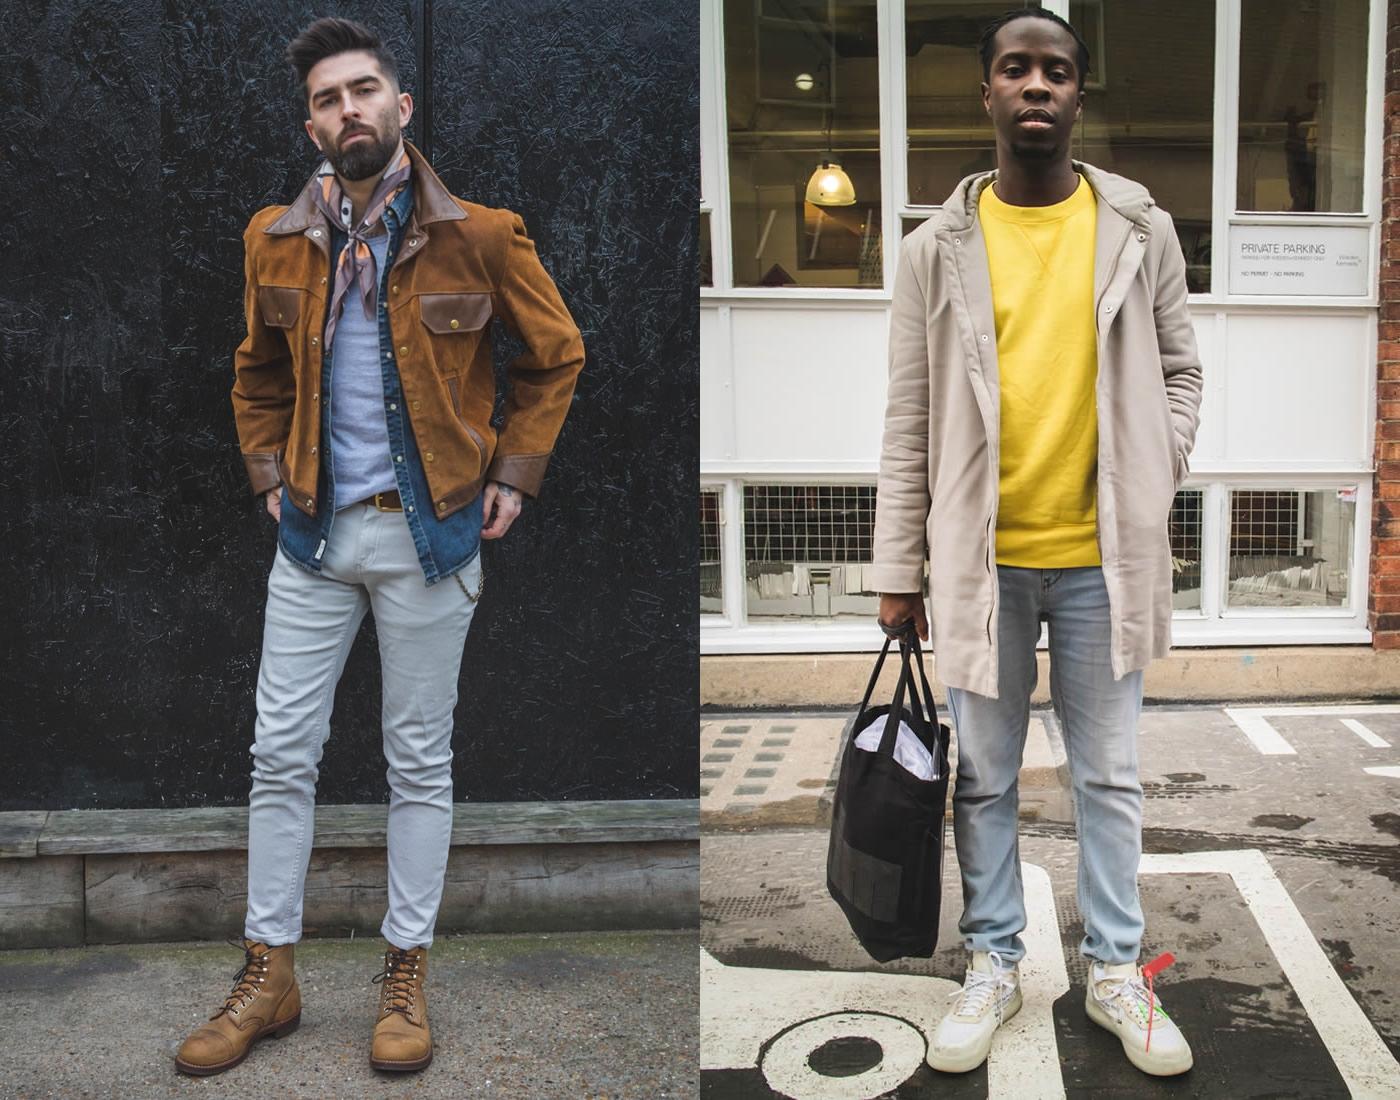 99168eb8afa97d 9 tendências do street style inverno 2019 masculino - MODA SEM ...